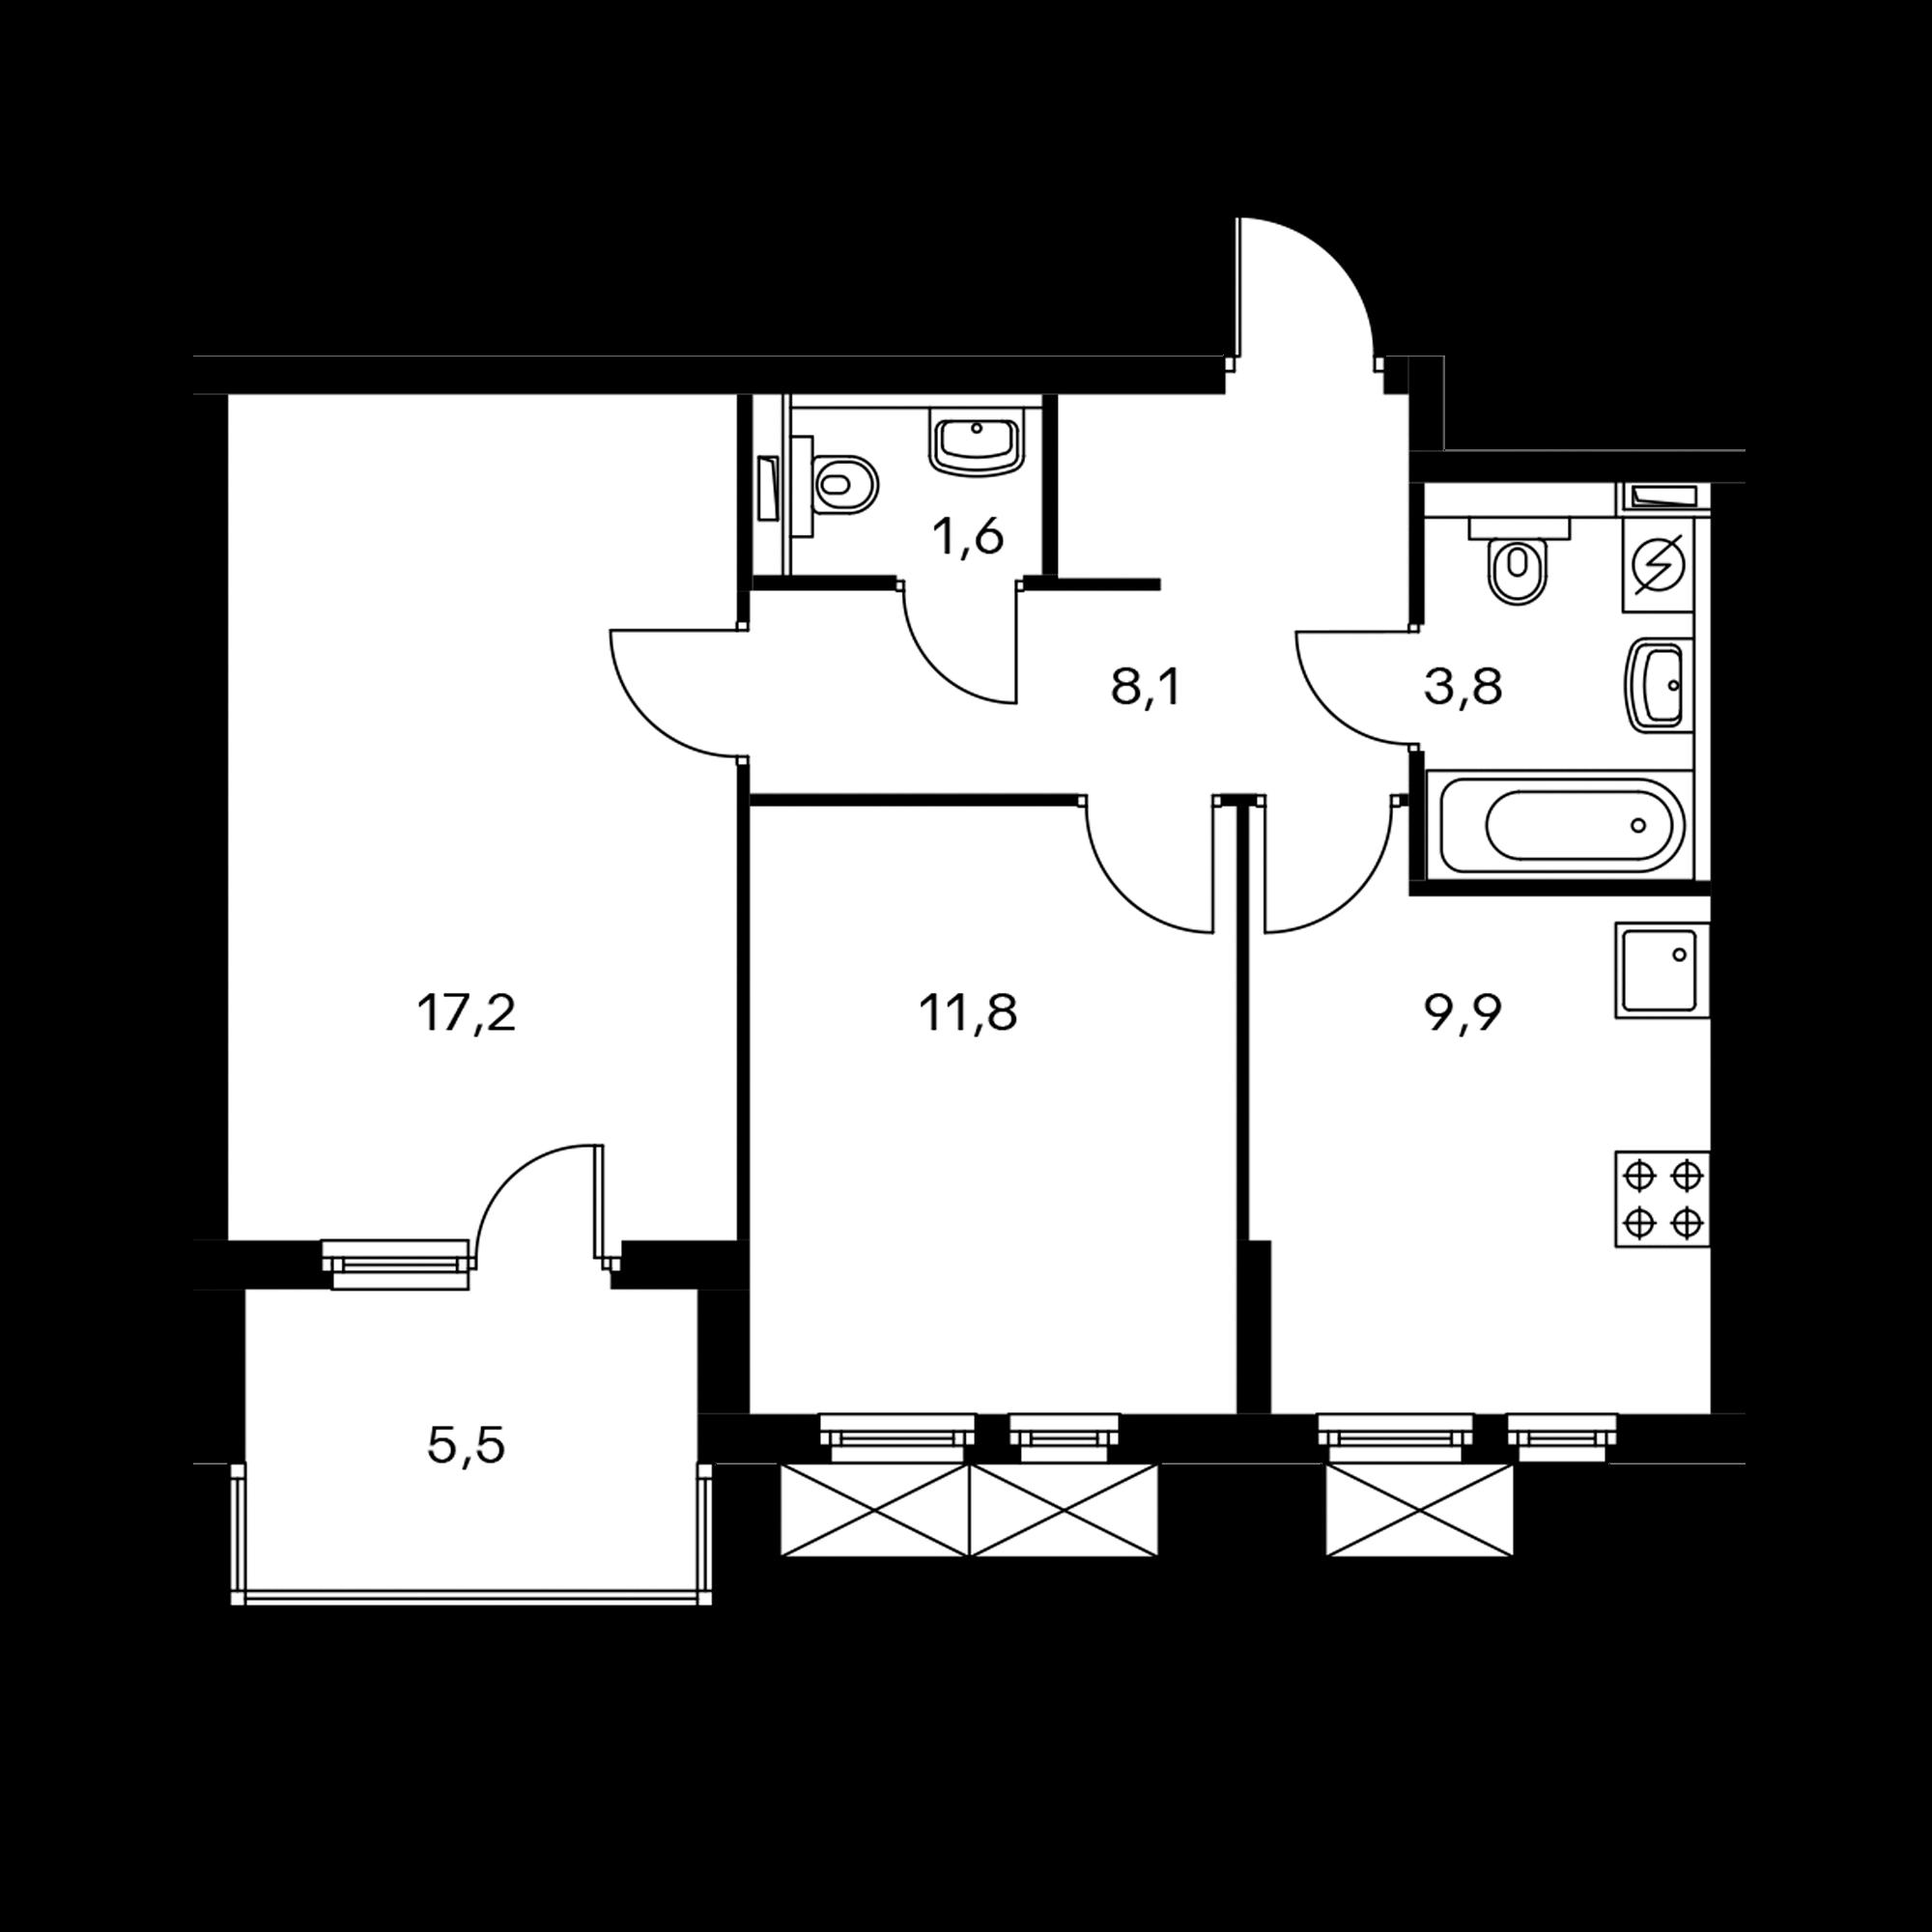 2KM6_10.2-1_S_ZB